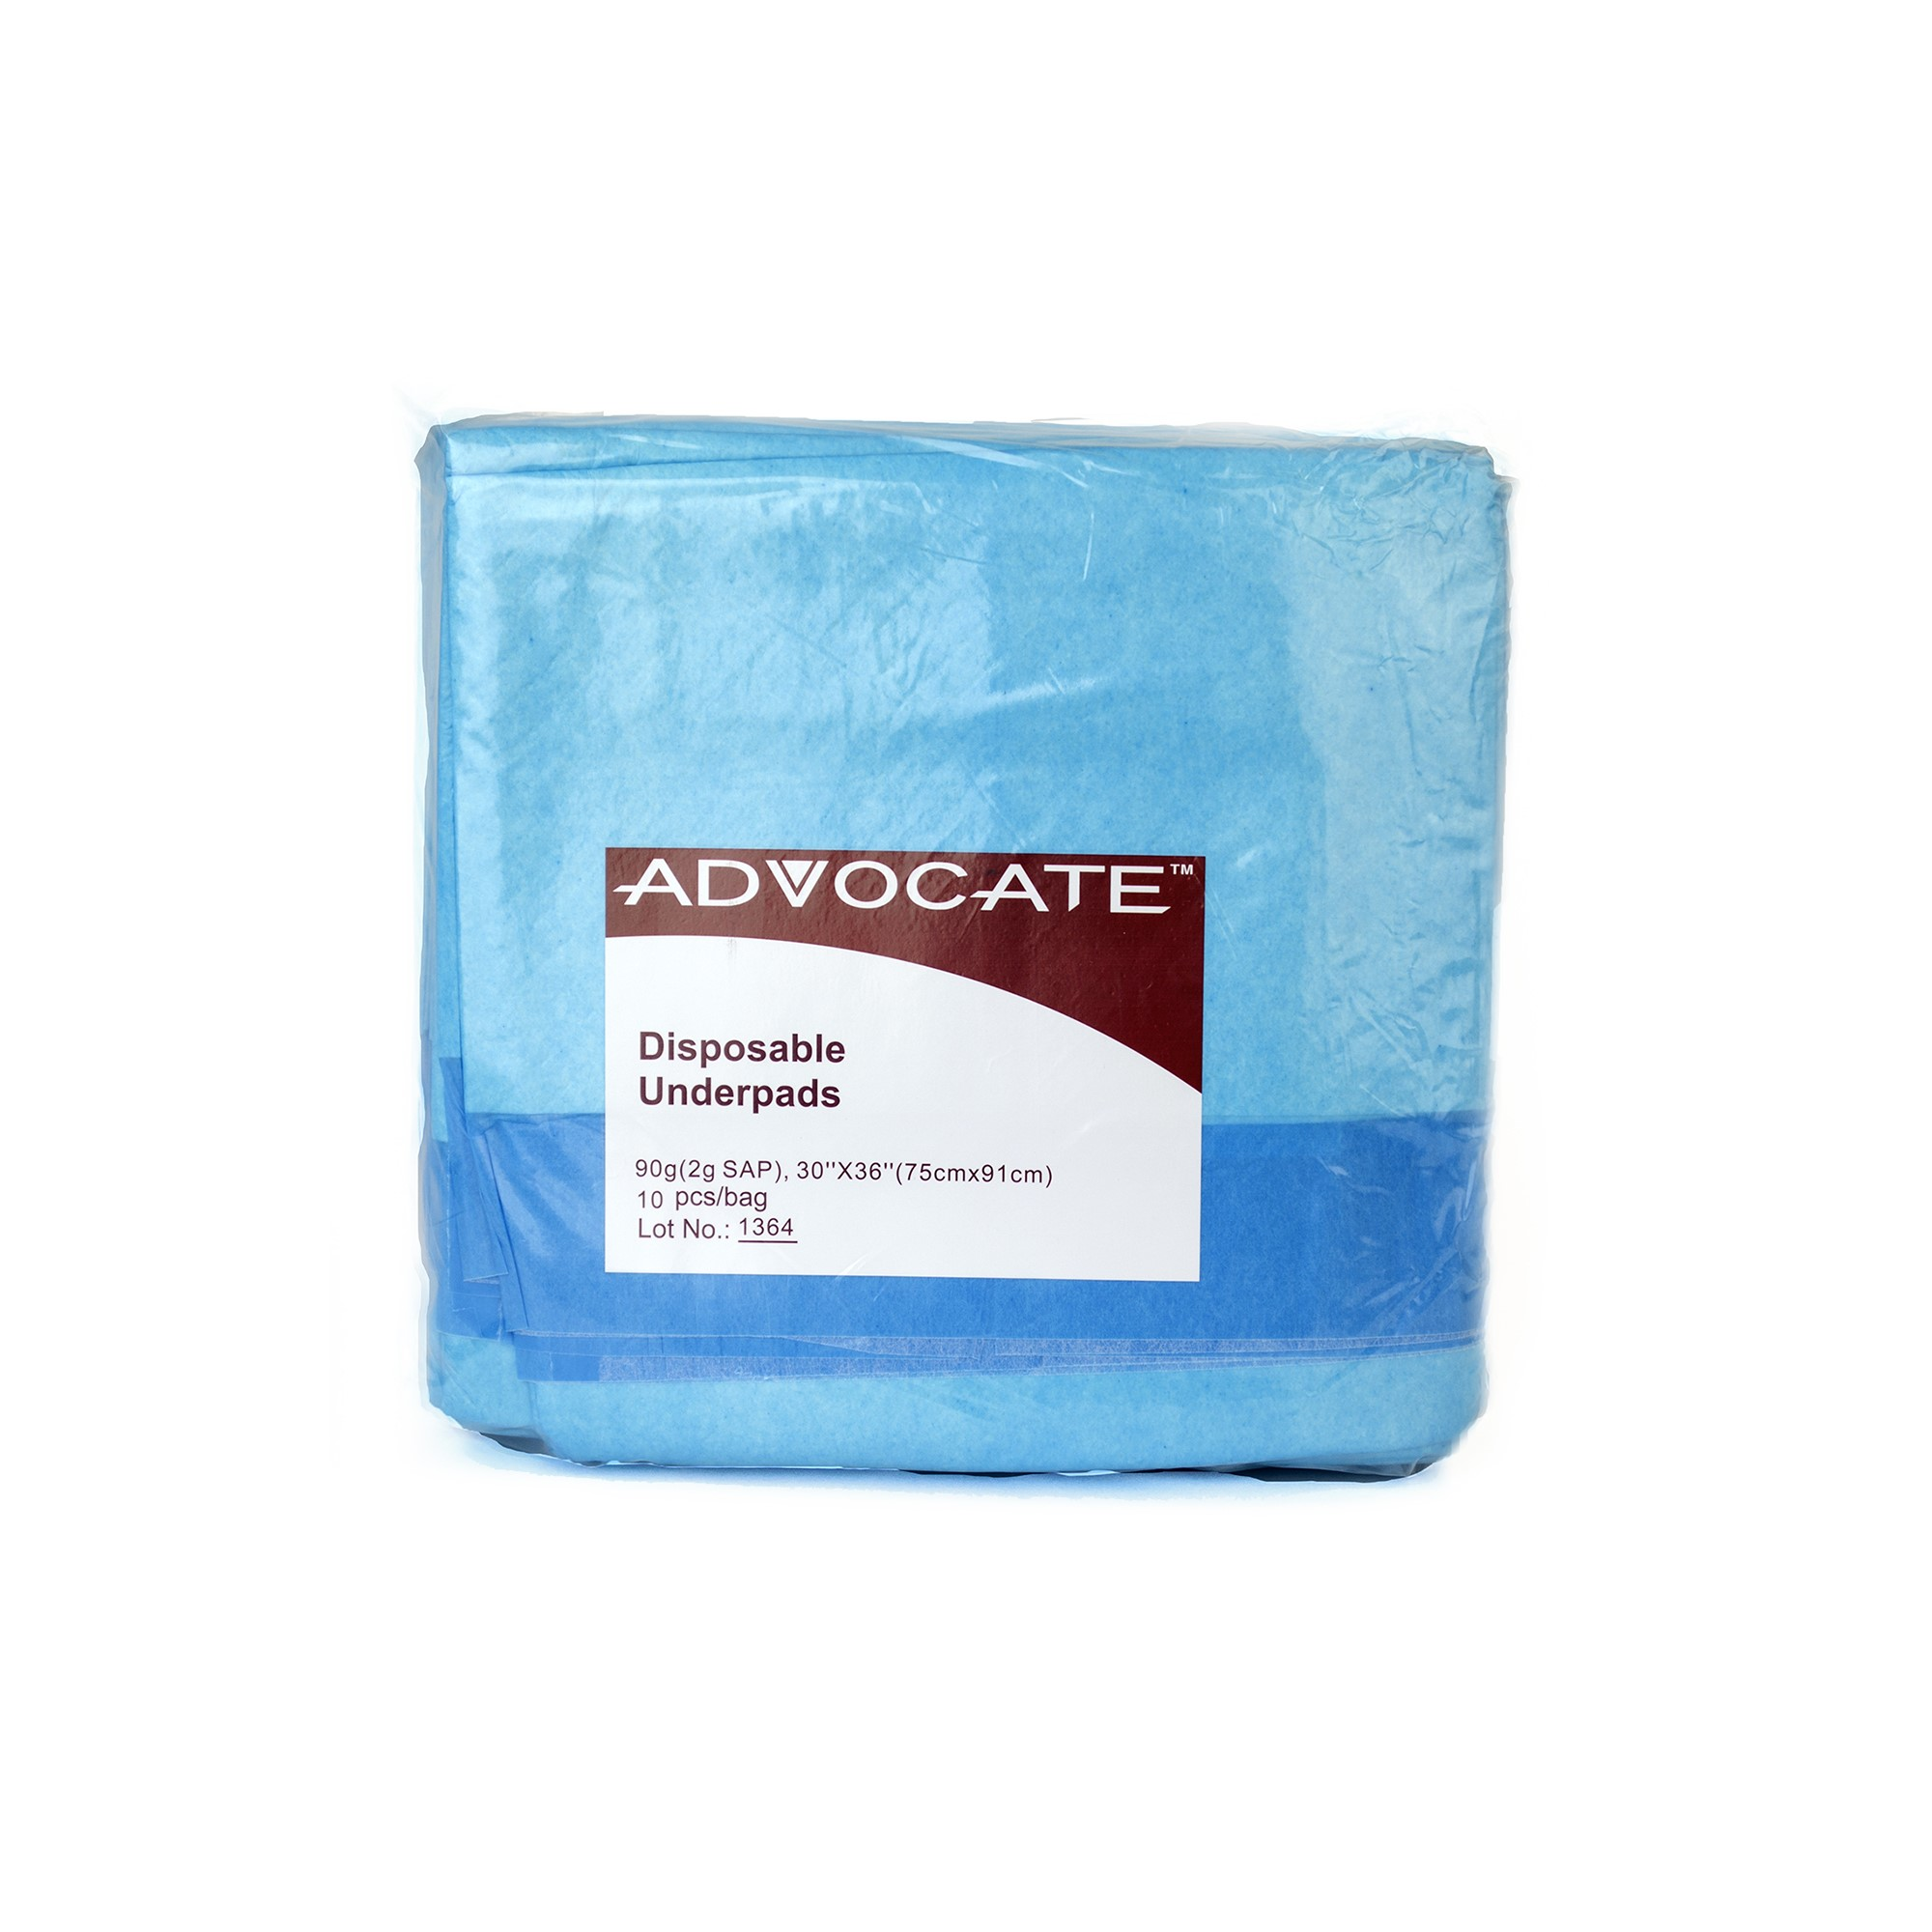 Advocate Disposable Underpads, 3.2 Oz, 10 Ct